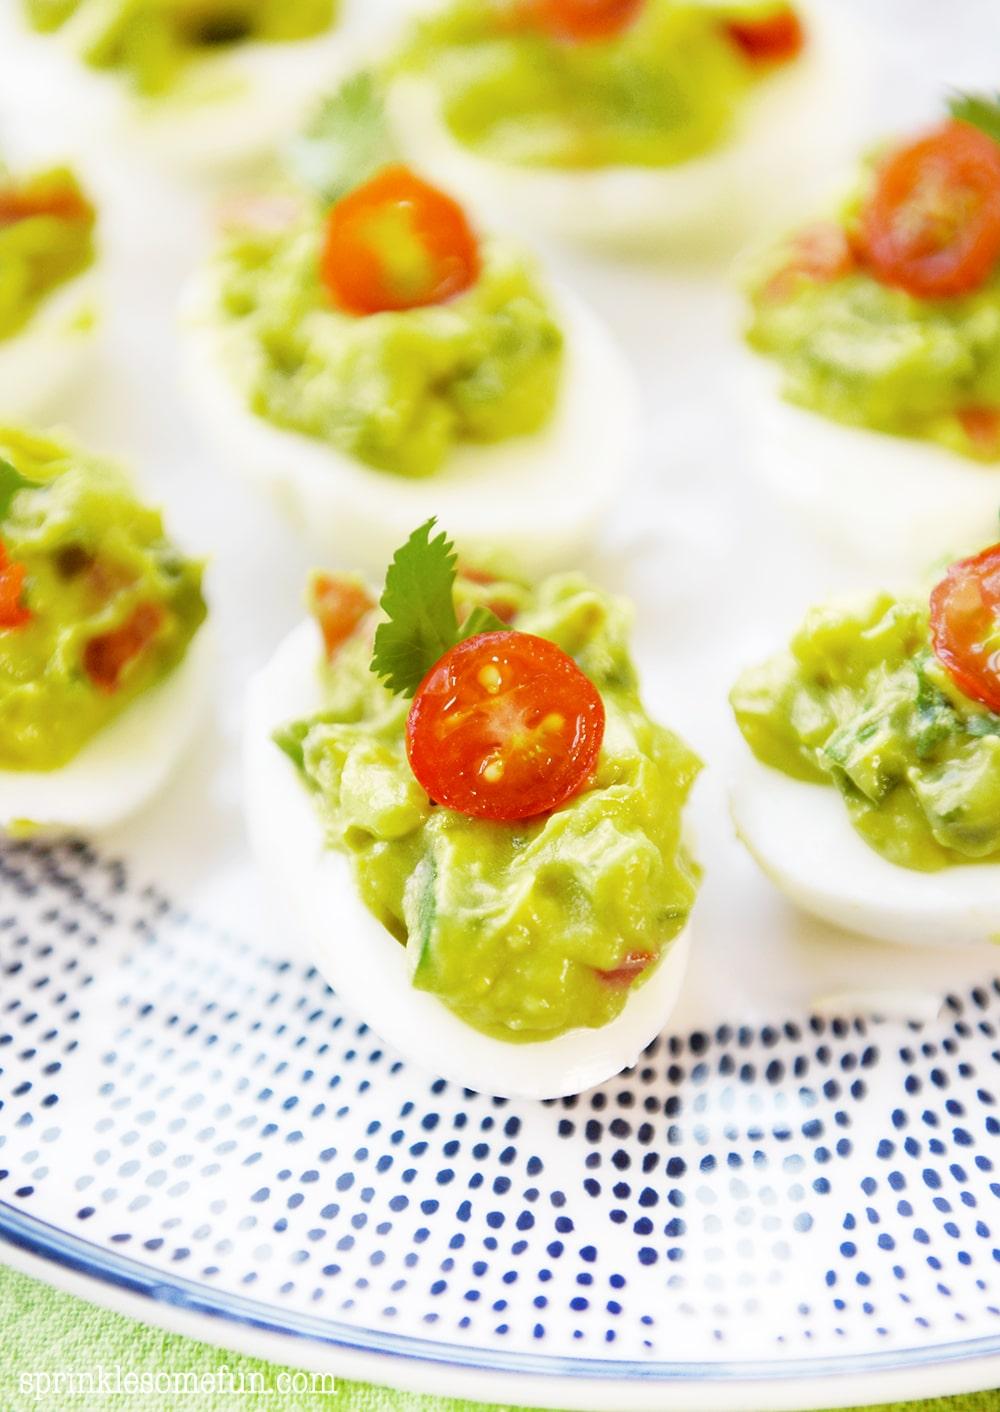 Guacamole deviled eggs are healthy, fun and tasty.